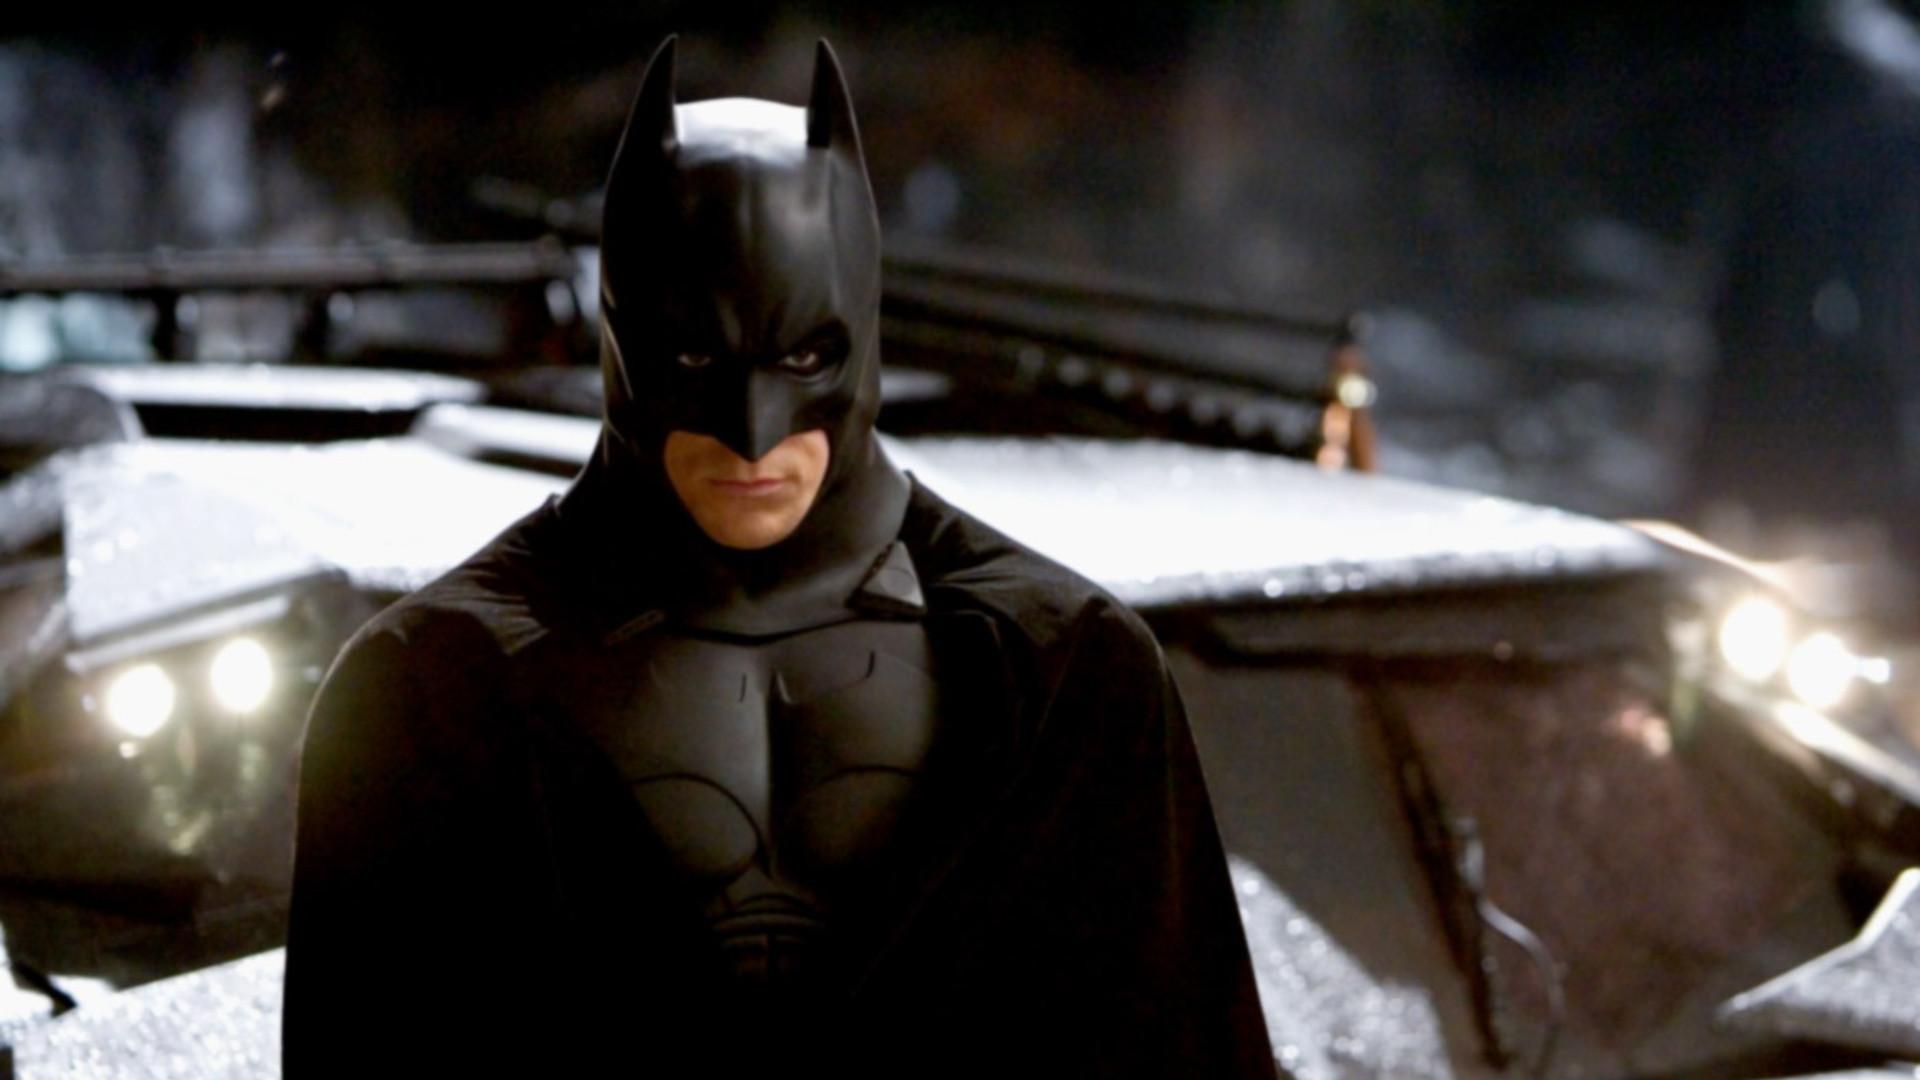 HQ Batman Begins Wallpapers | File 248.01Kb